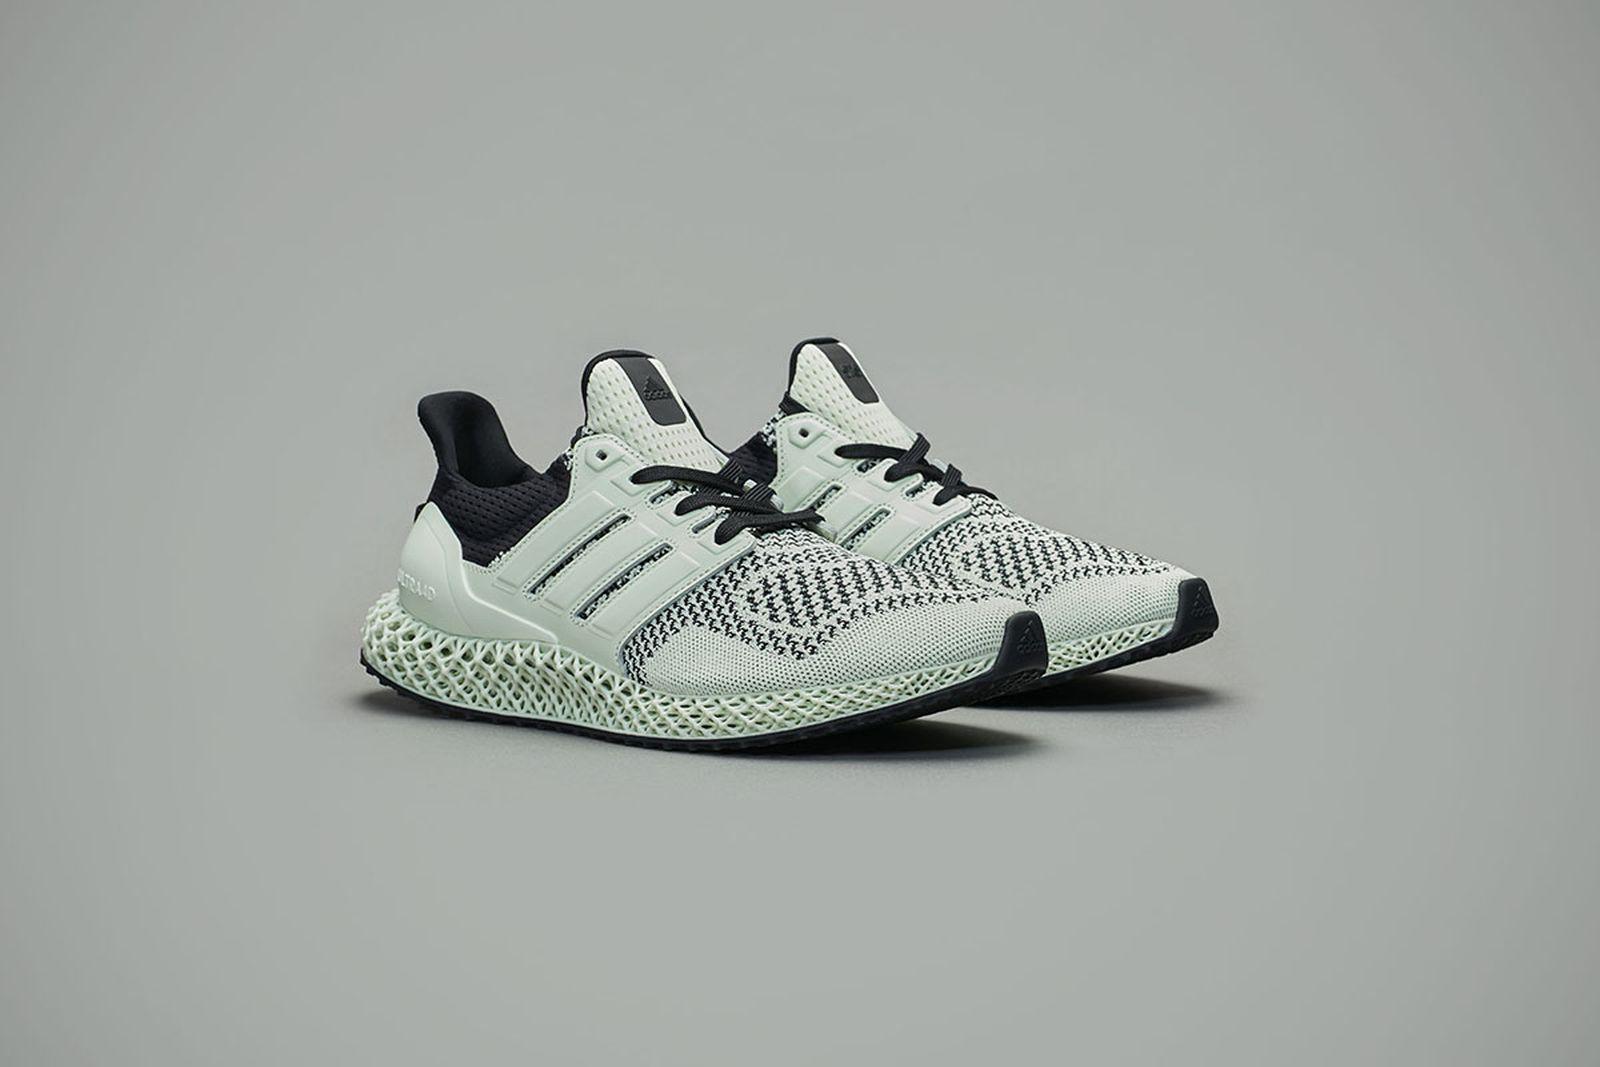 sneakersnstuff-adidas-ultra4d-green-teatime-release-date-price-1-02